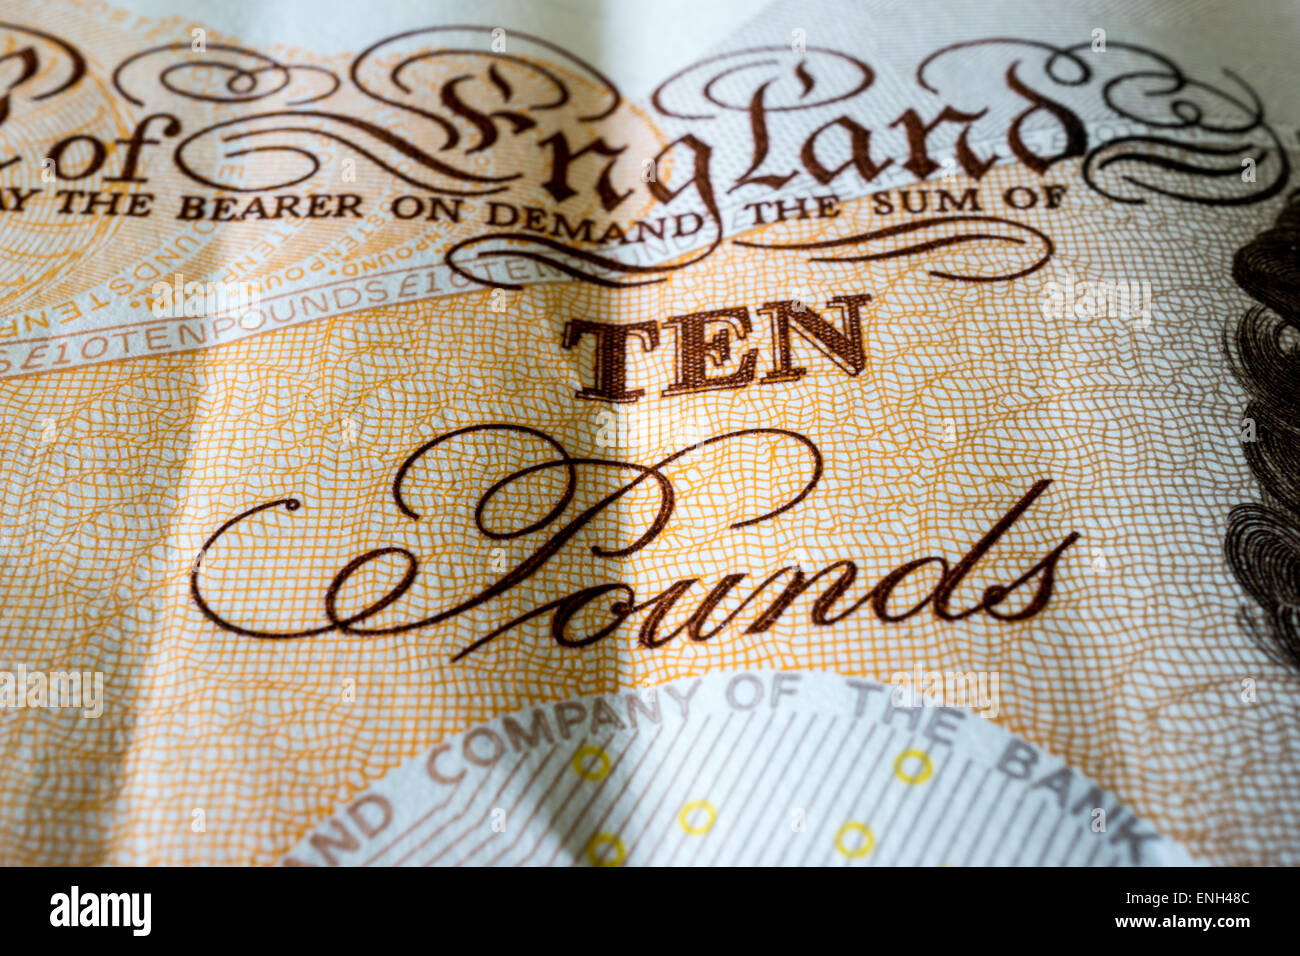 a-close-up-of-a-british-ten-pound-note-E